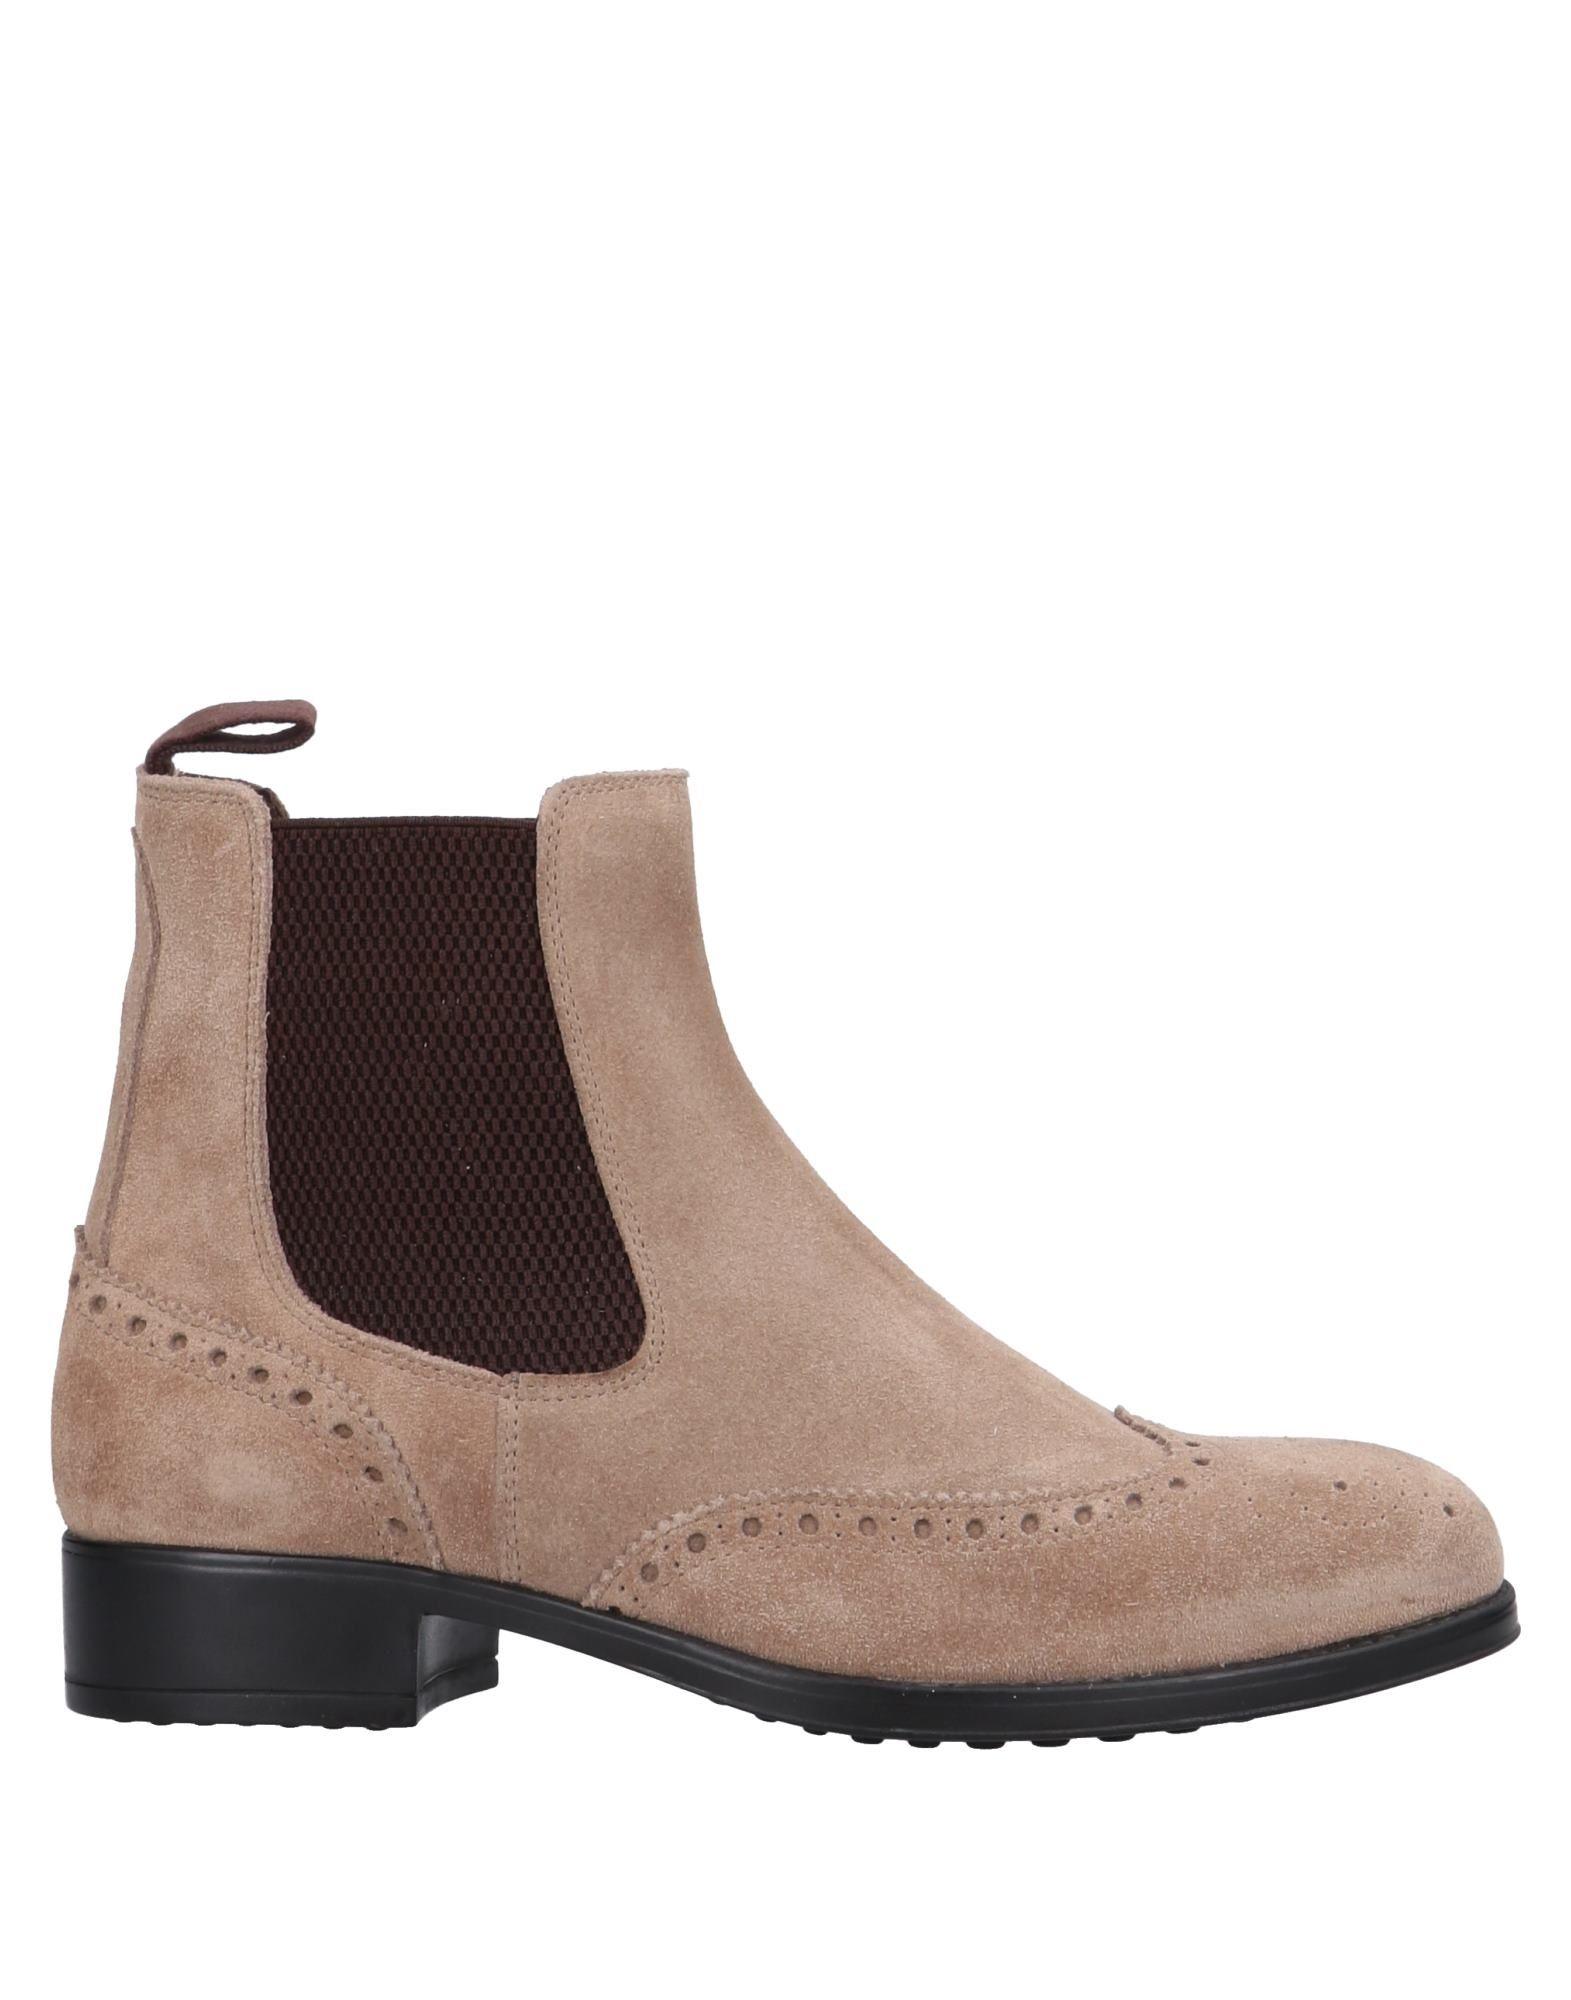 Chelsea Boots Hundred Donna 100 Donna Hundred - 11546689XB b5f839